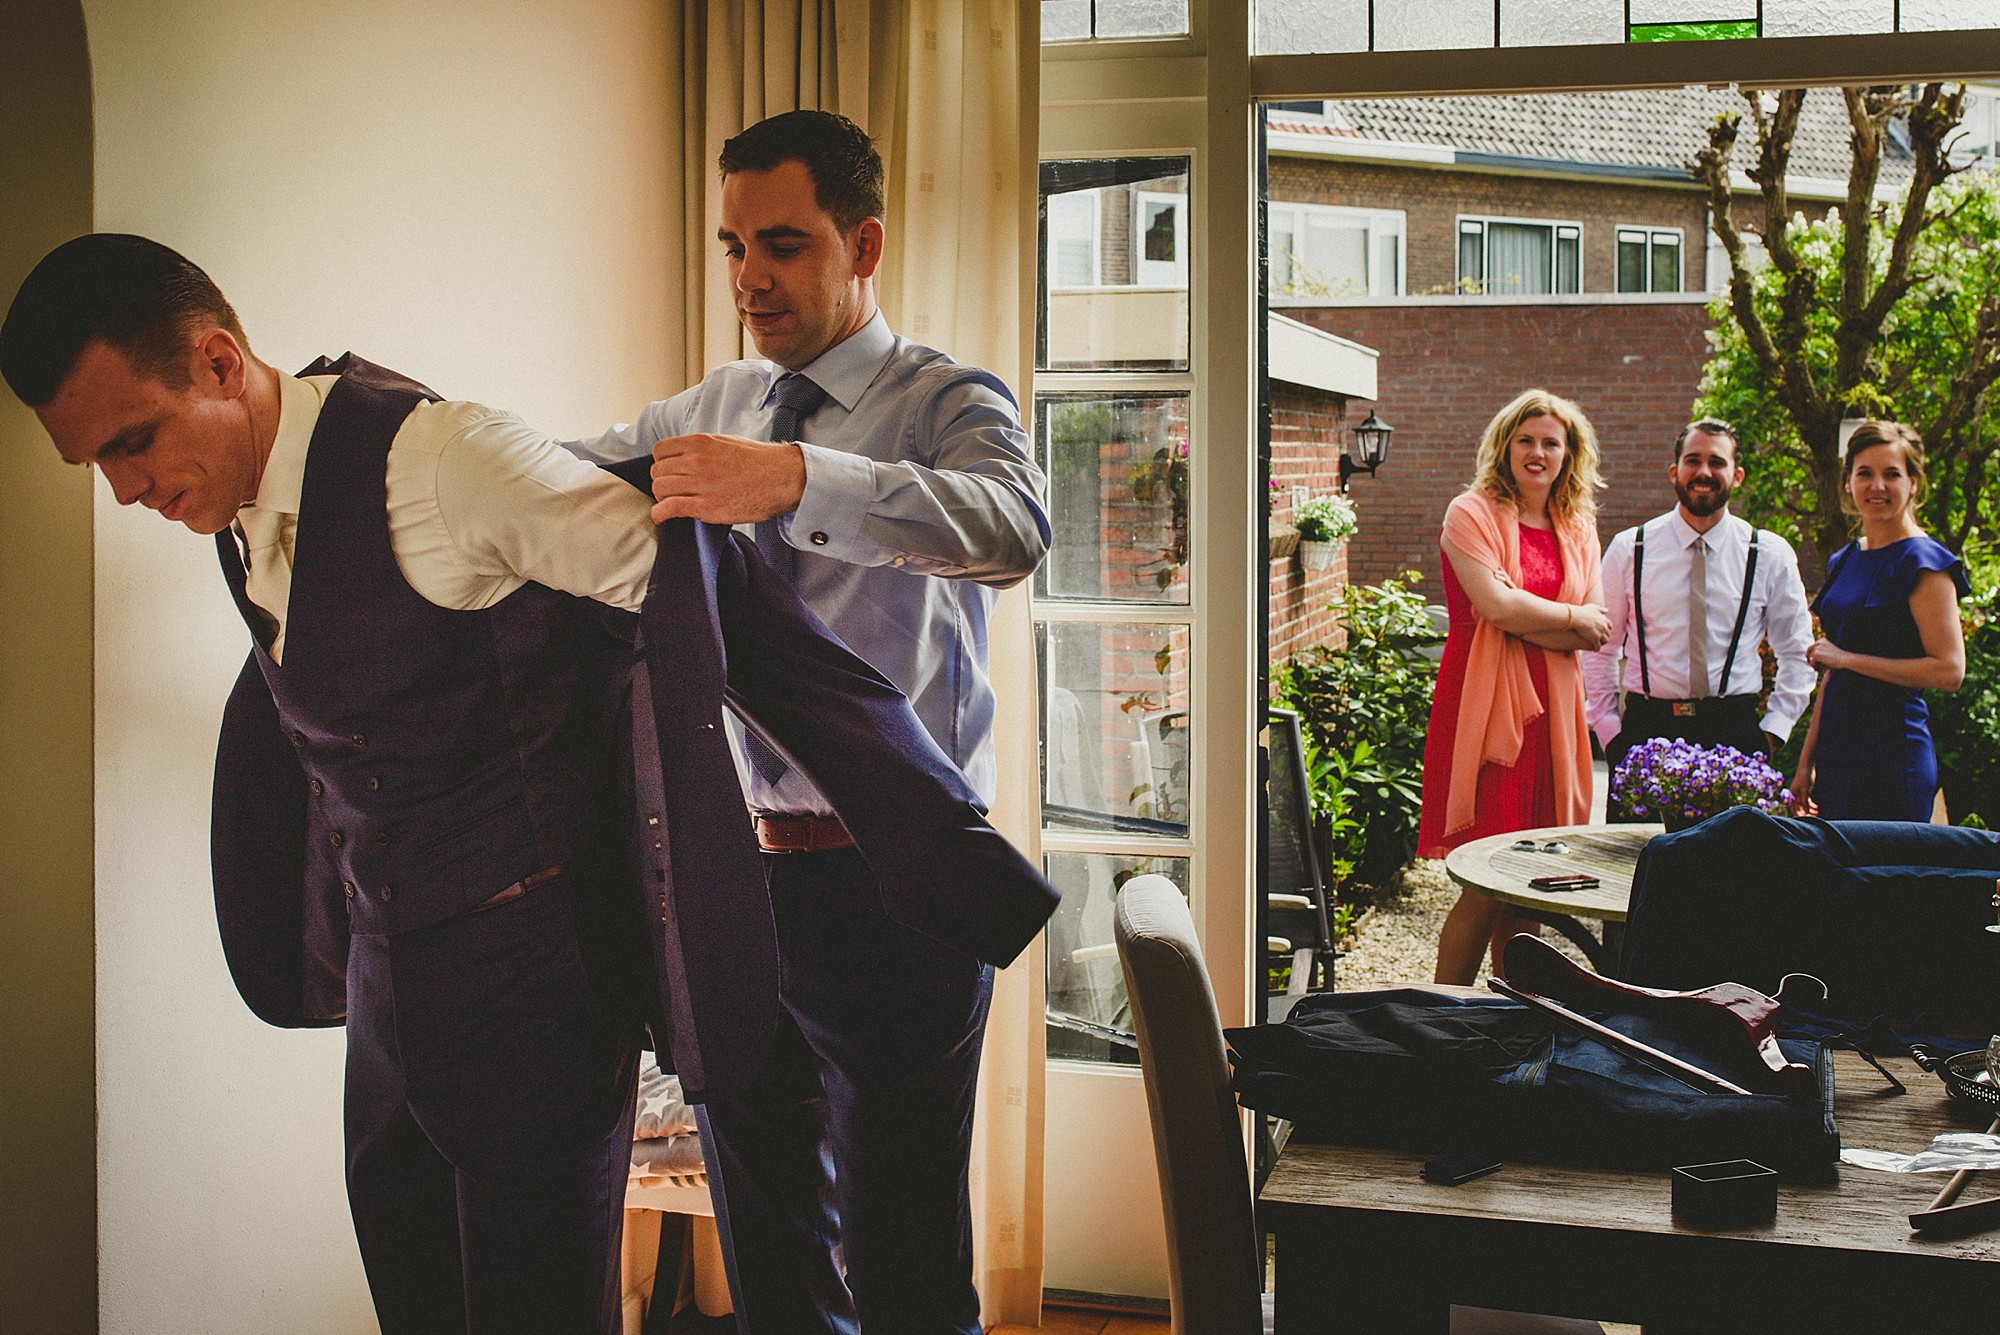 beste trouwfotograaf van nederland (1 van 1).jpg